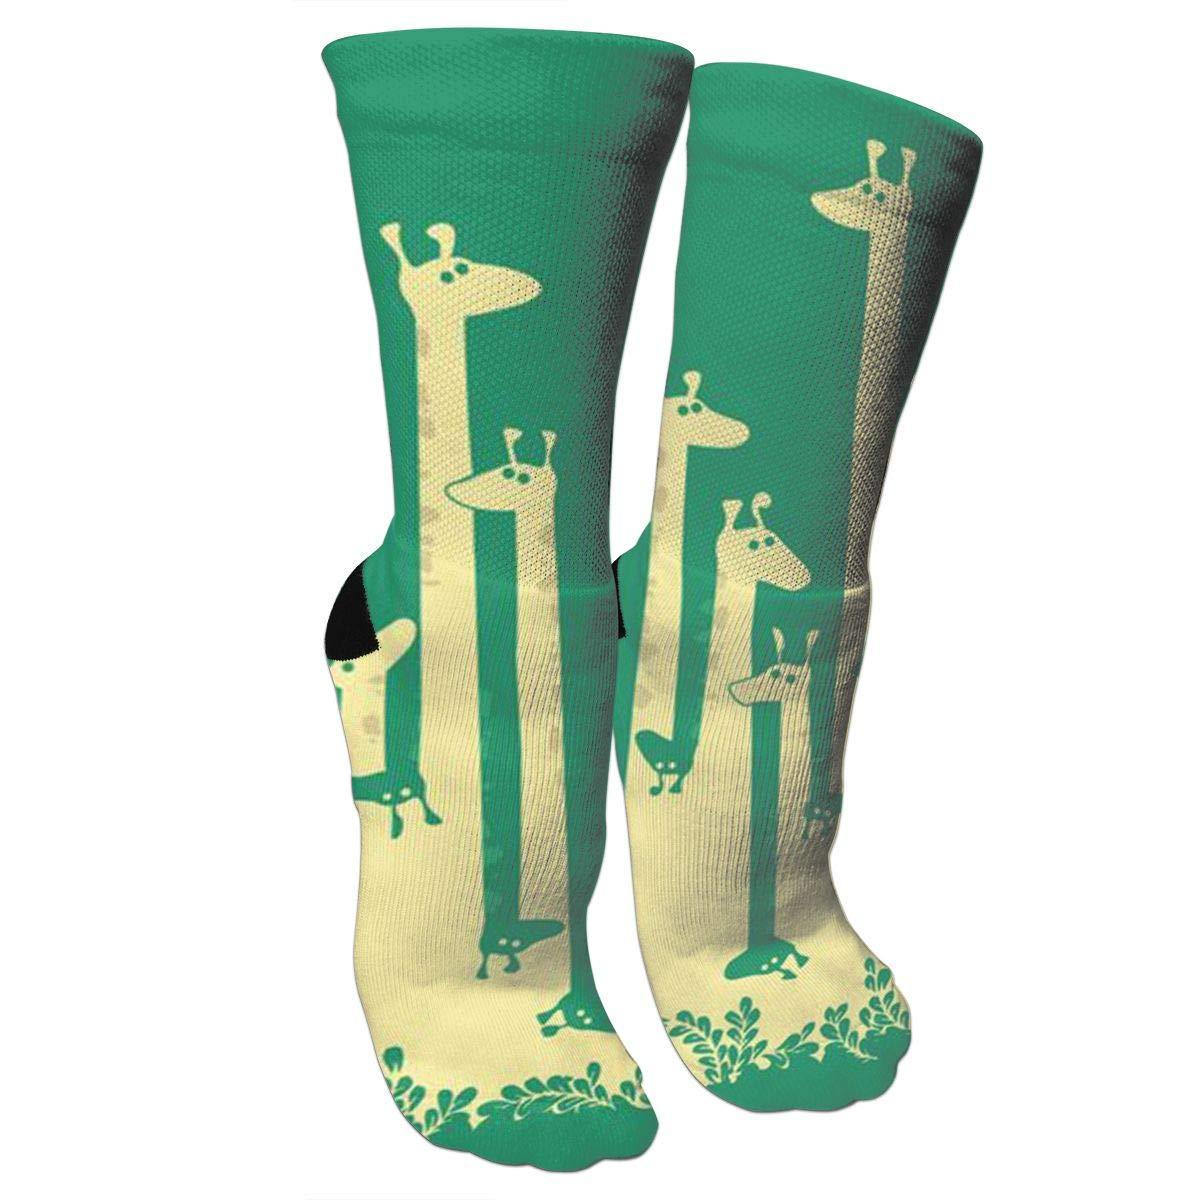 Green Giraffe Crazy Socks Soft Breathable Casual Socks For Sports Athletic Running